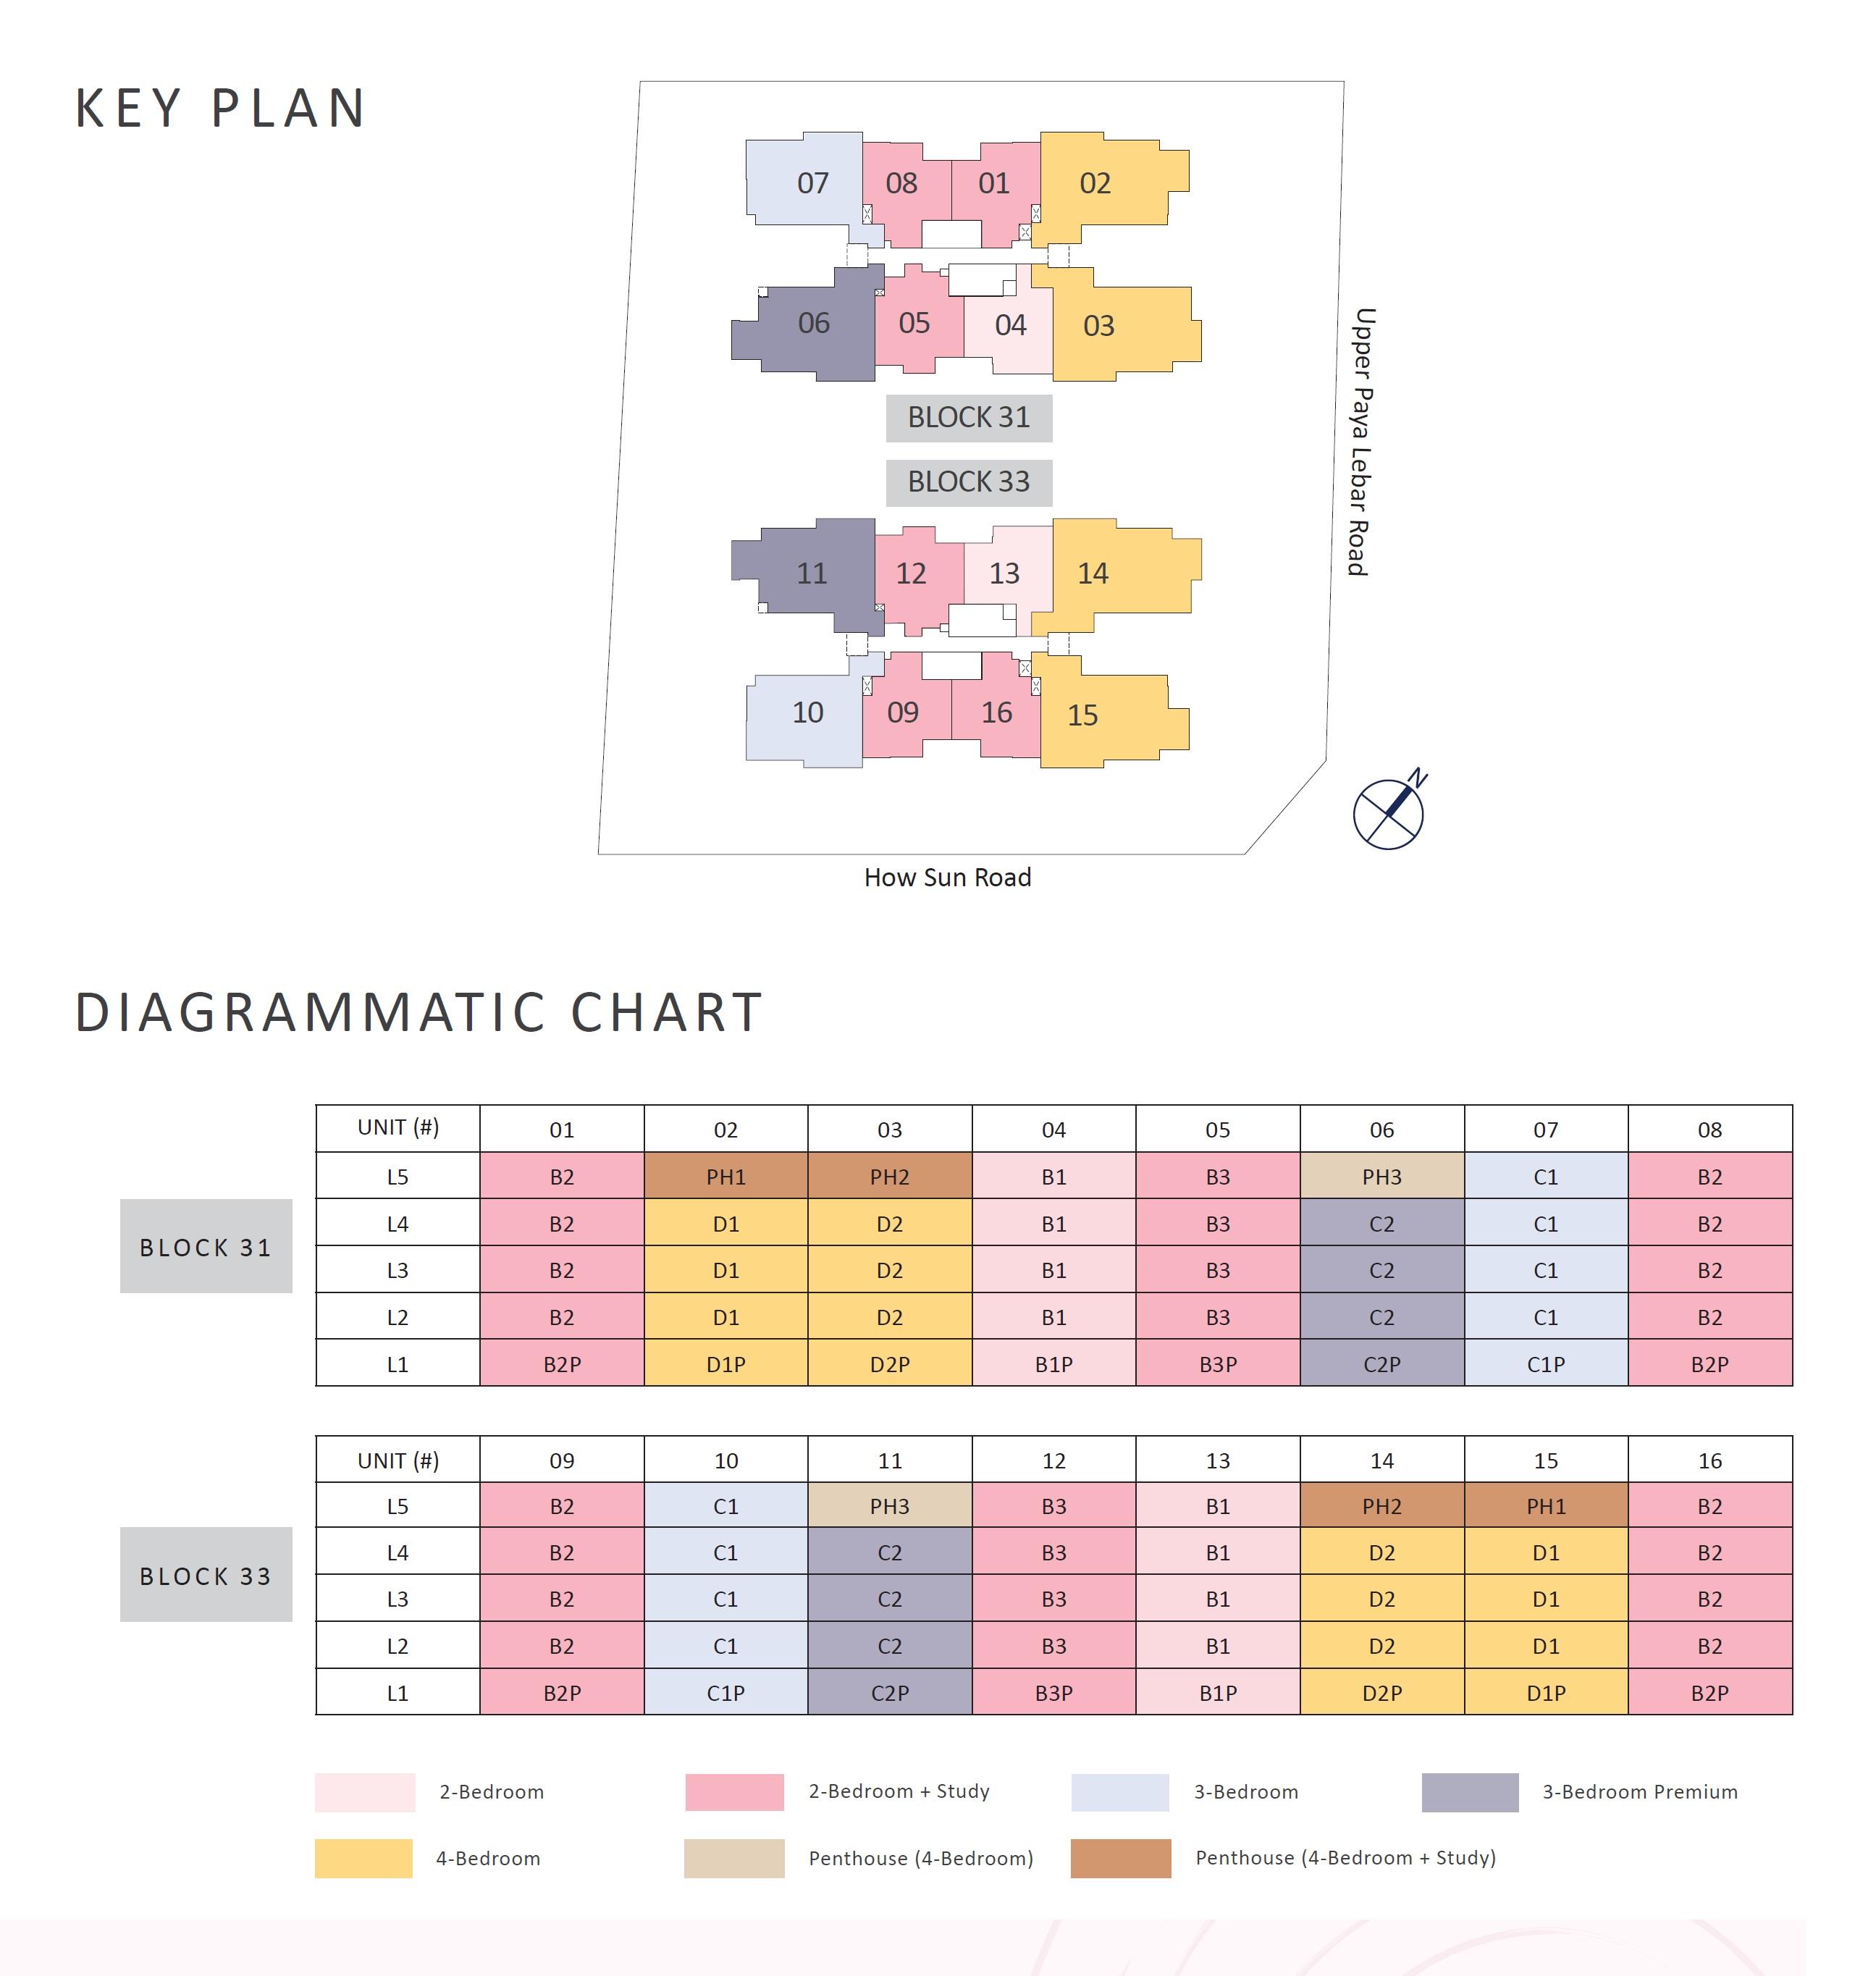 The Lilium (莲逸轩) site plan